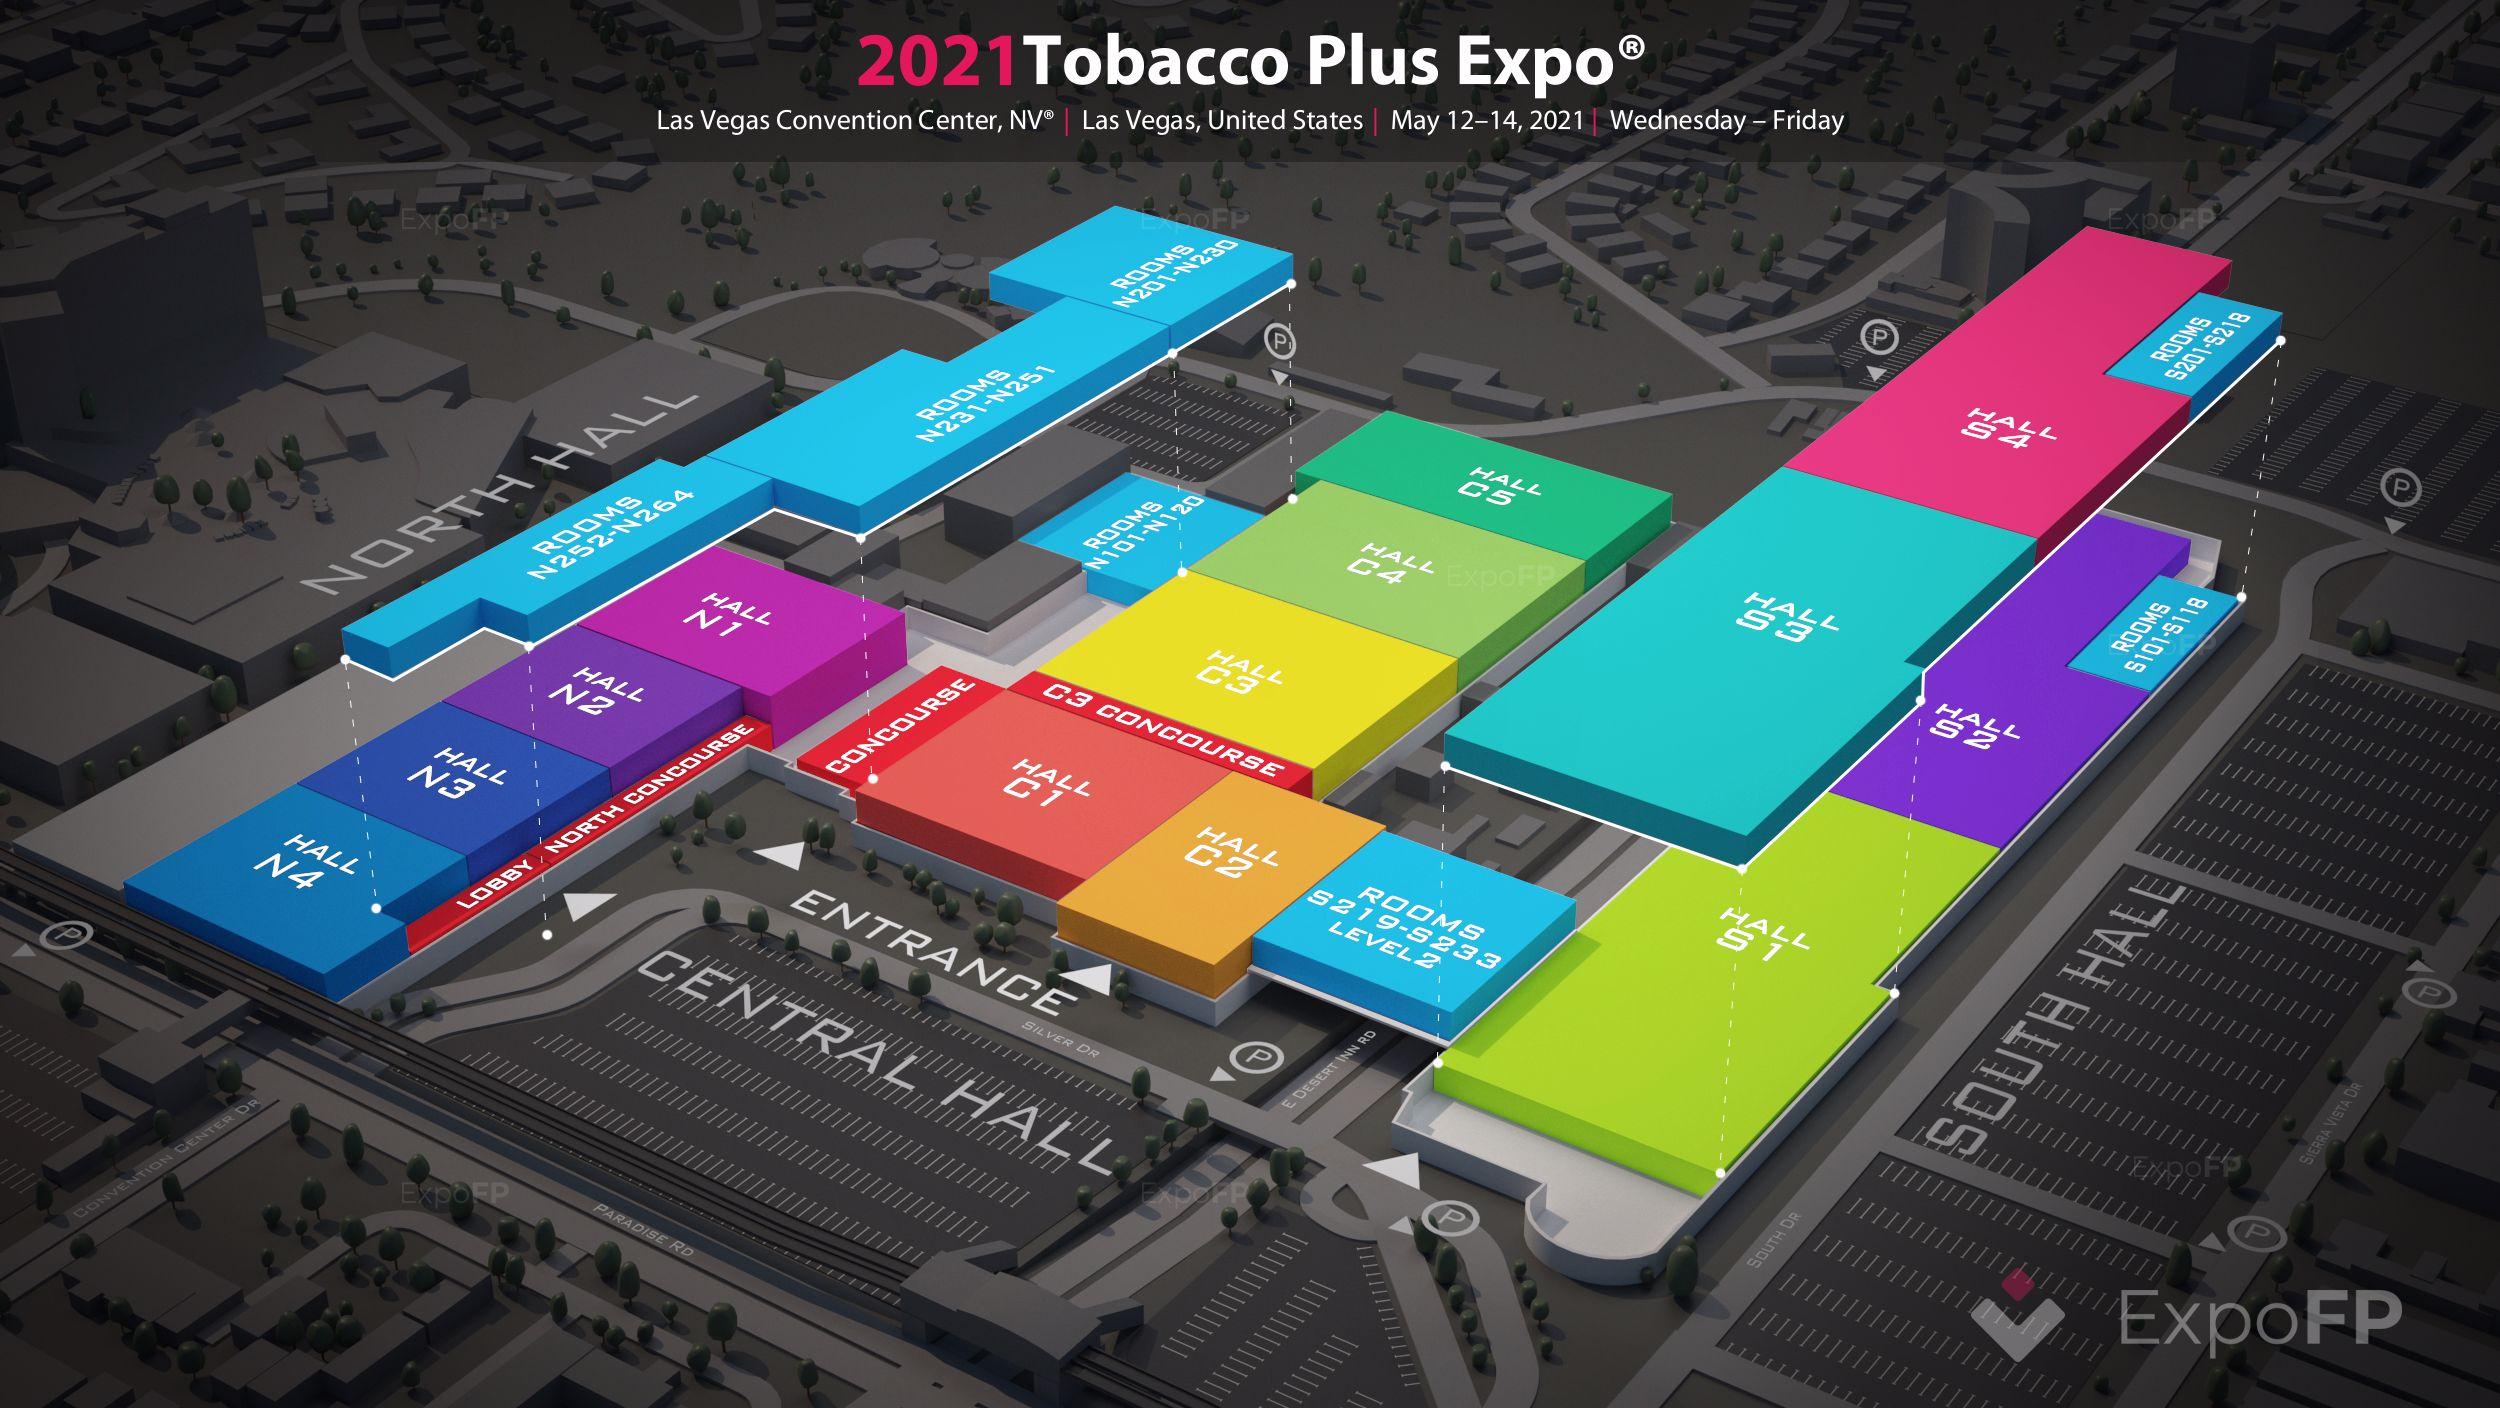 Tobacco plus expo 2021 las vegas | tobacco plus expo 2021 3d floorplan | tobacco plus expo 2021